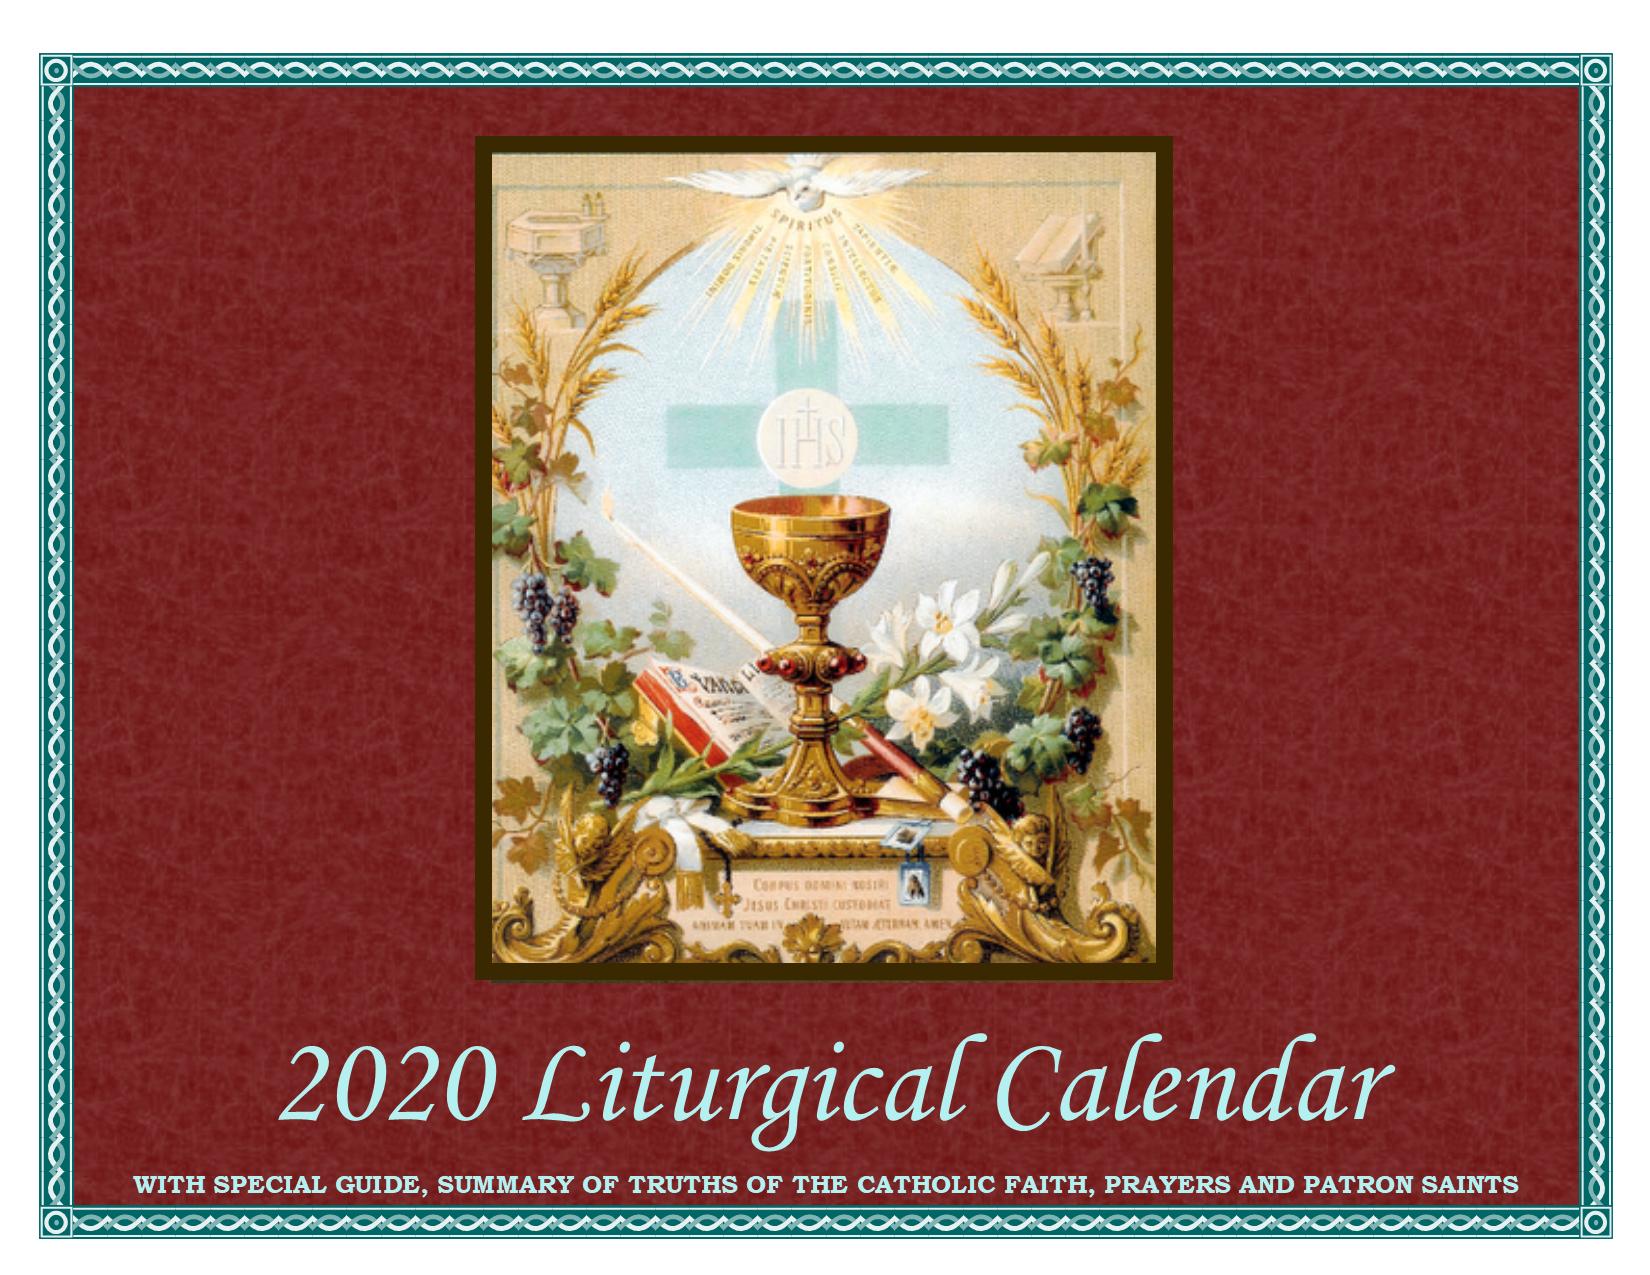 2020 Liturgical Calendar